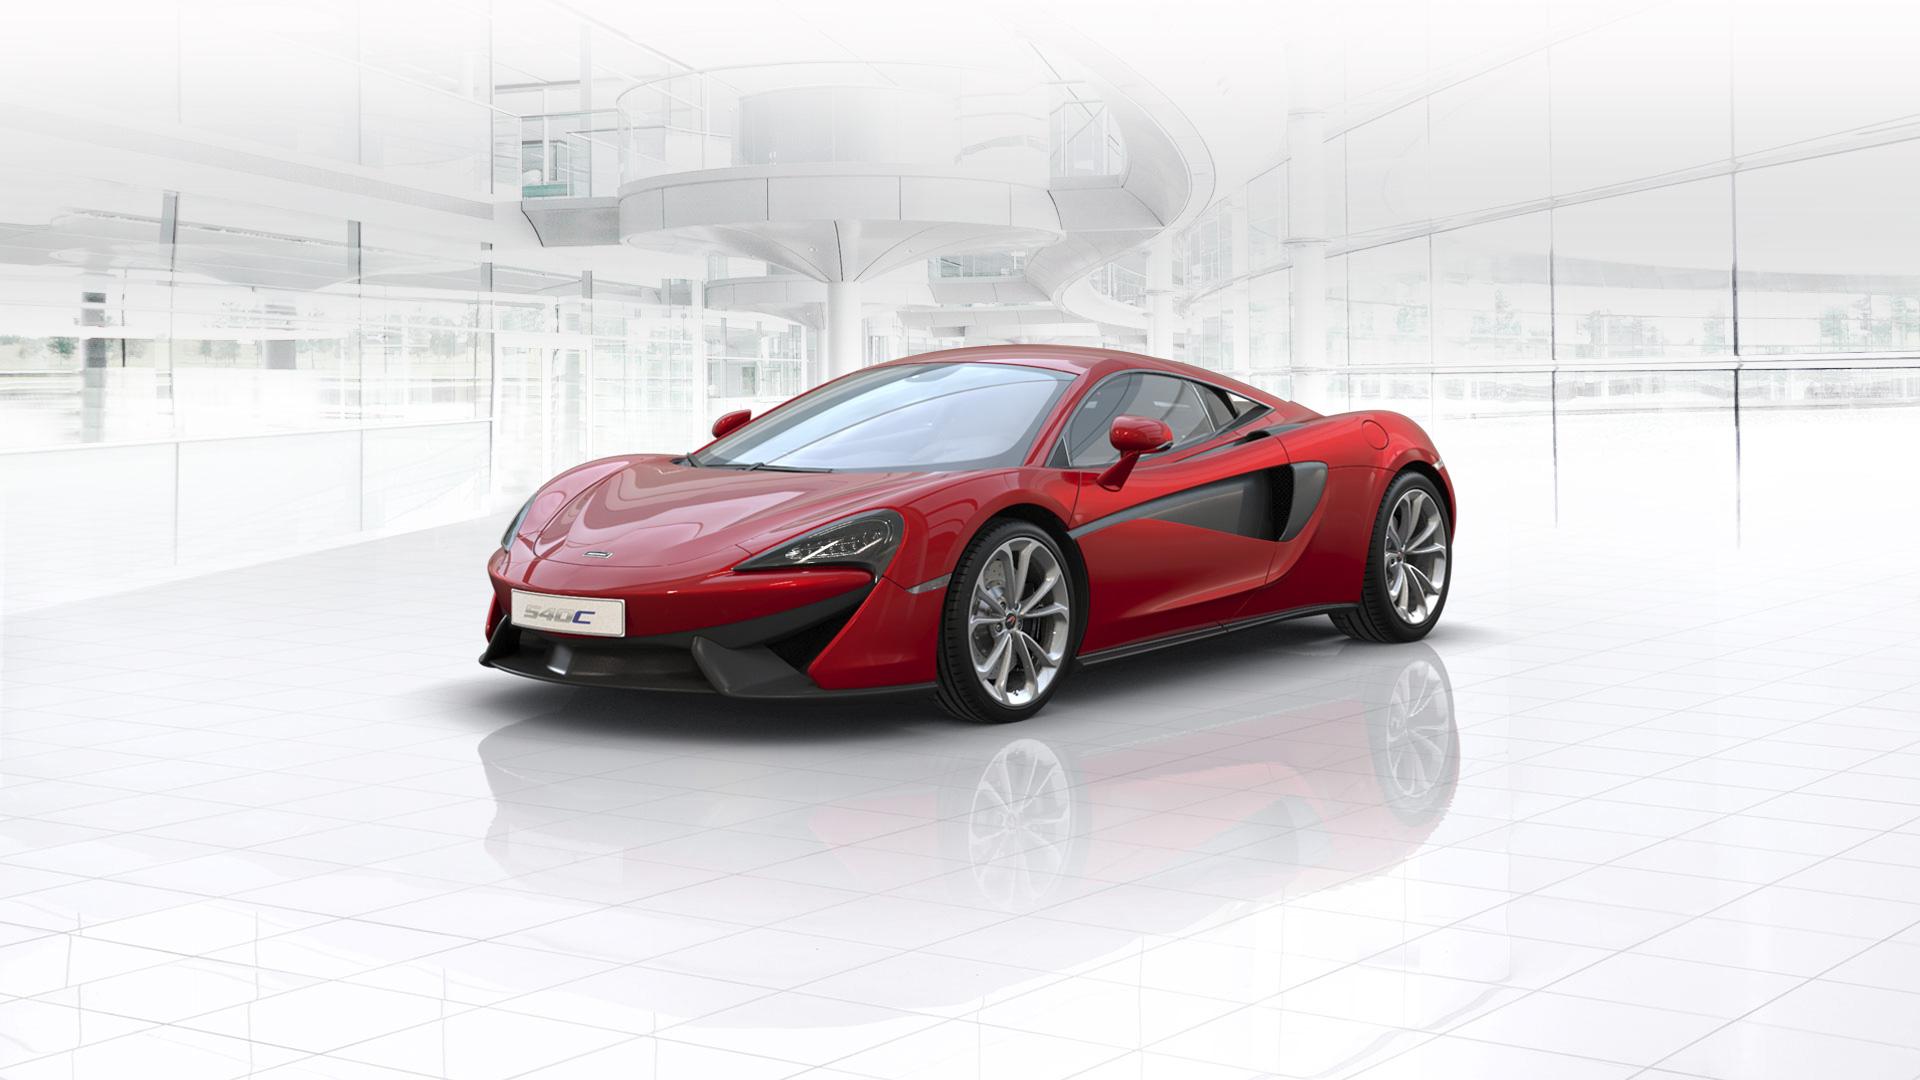 McLaren 540C-โฉบเฉี่ยว